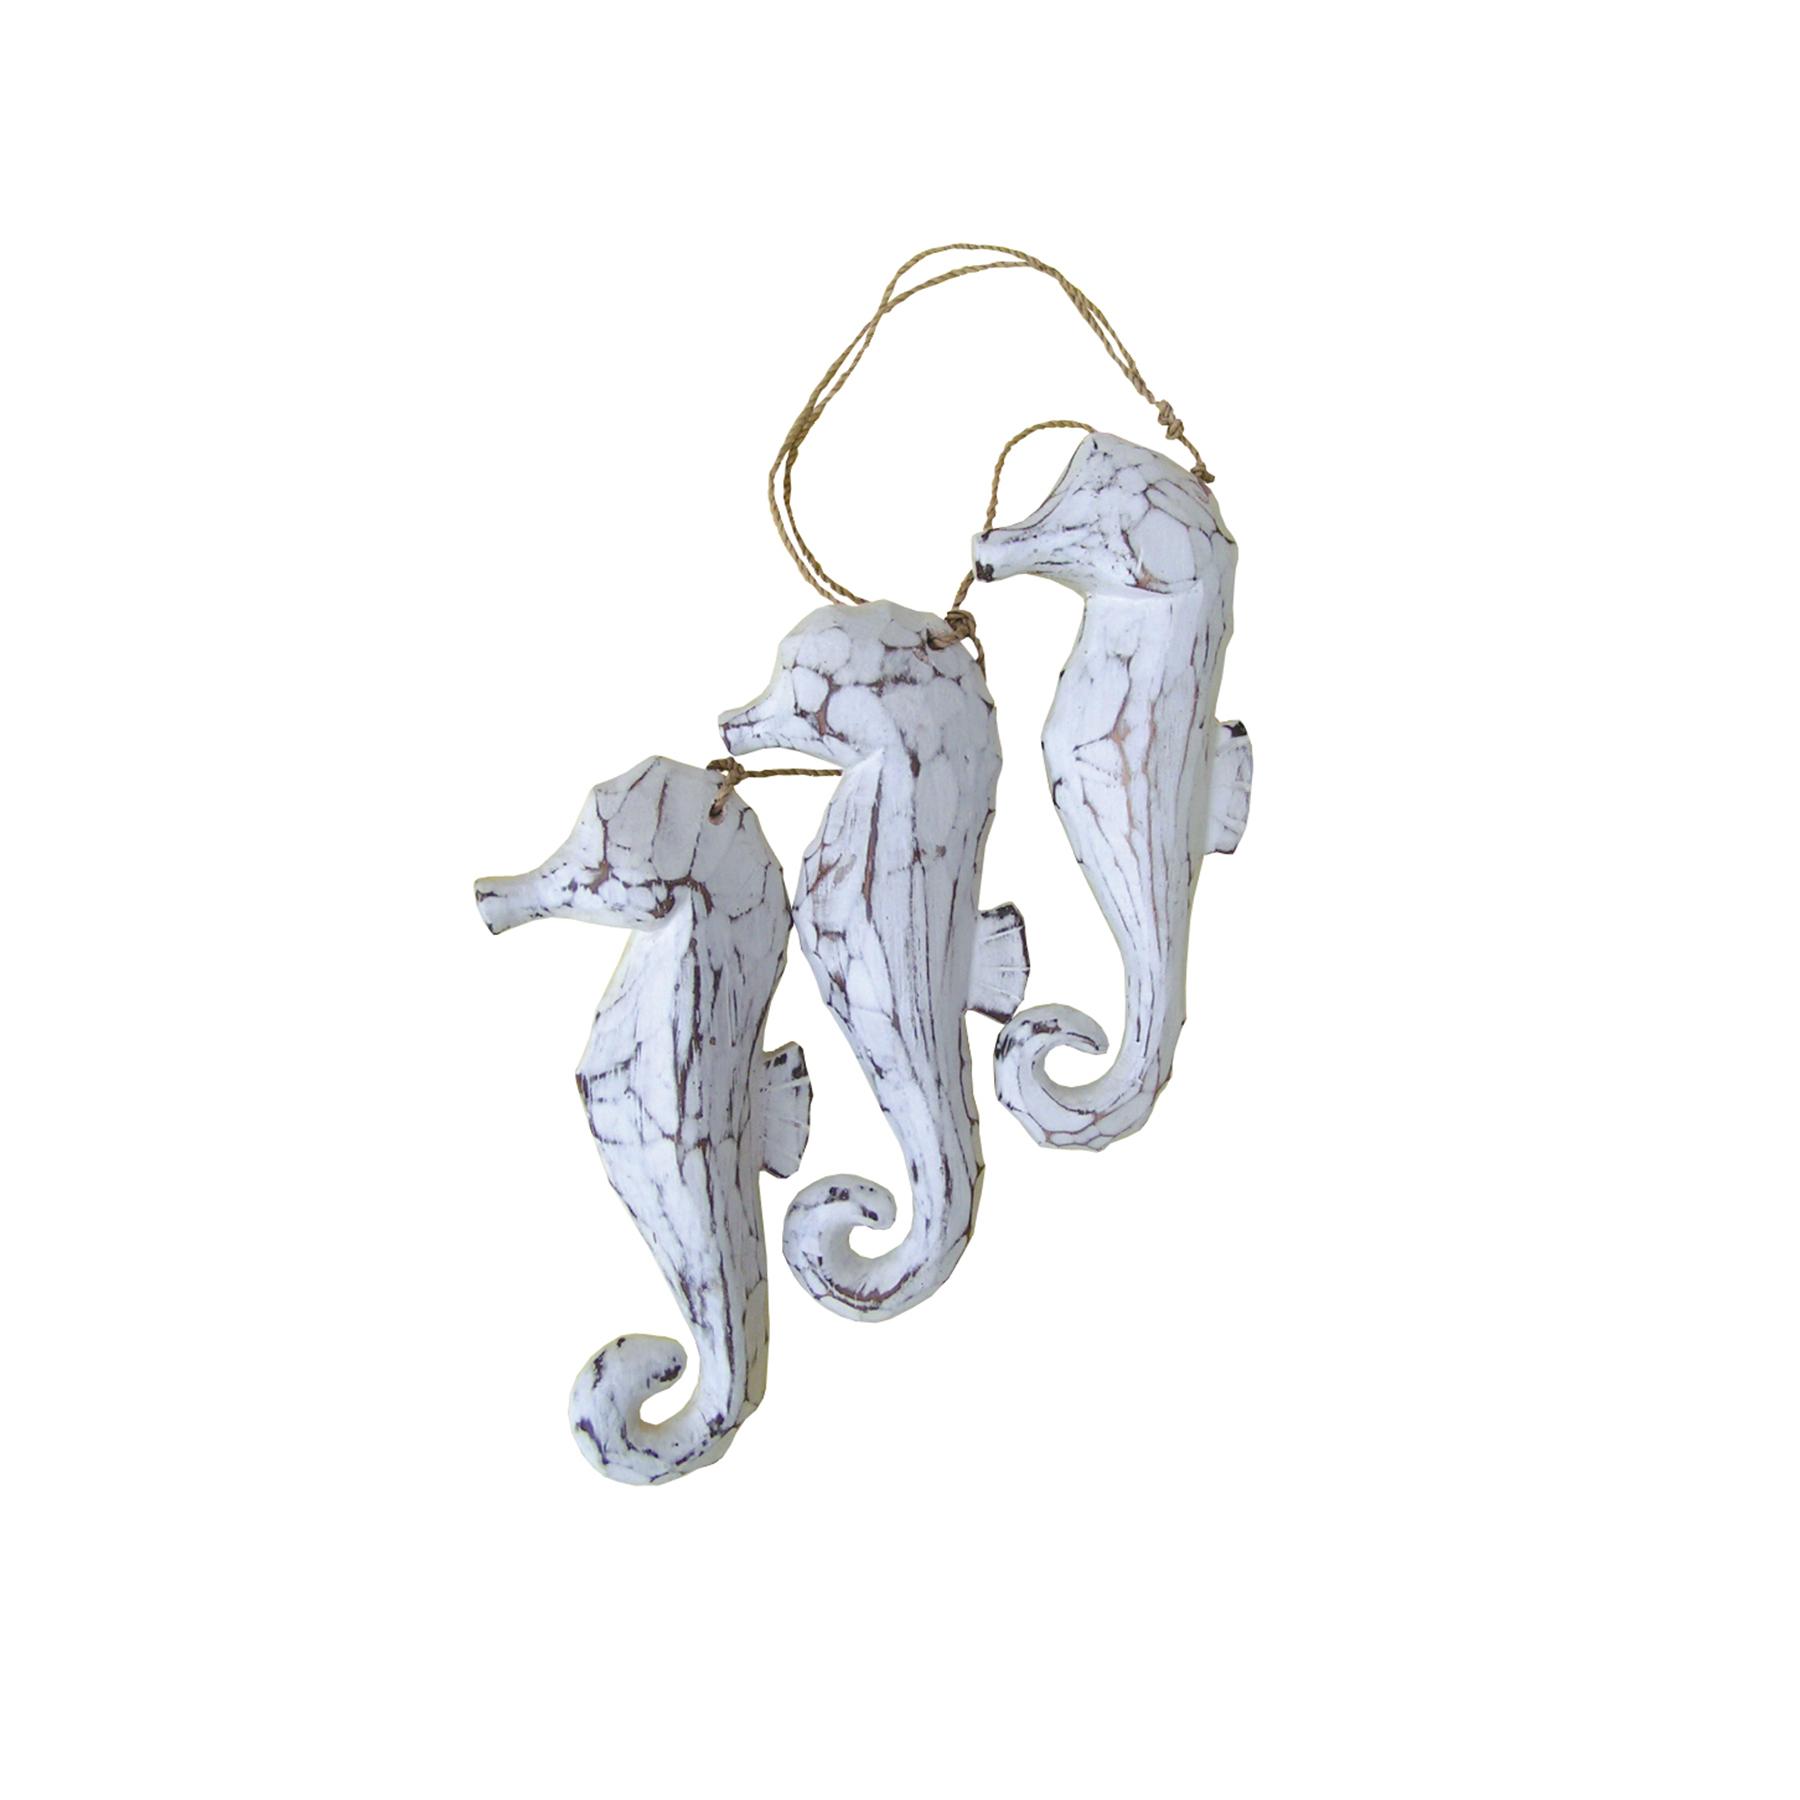 307W3 - 3 piece White Seahorse Rope